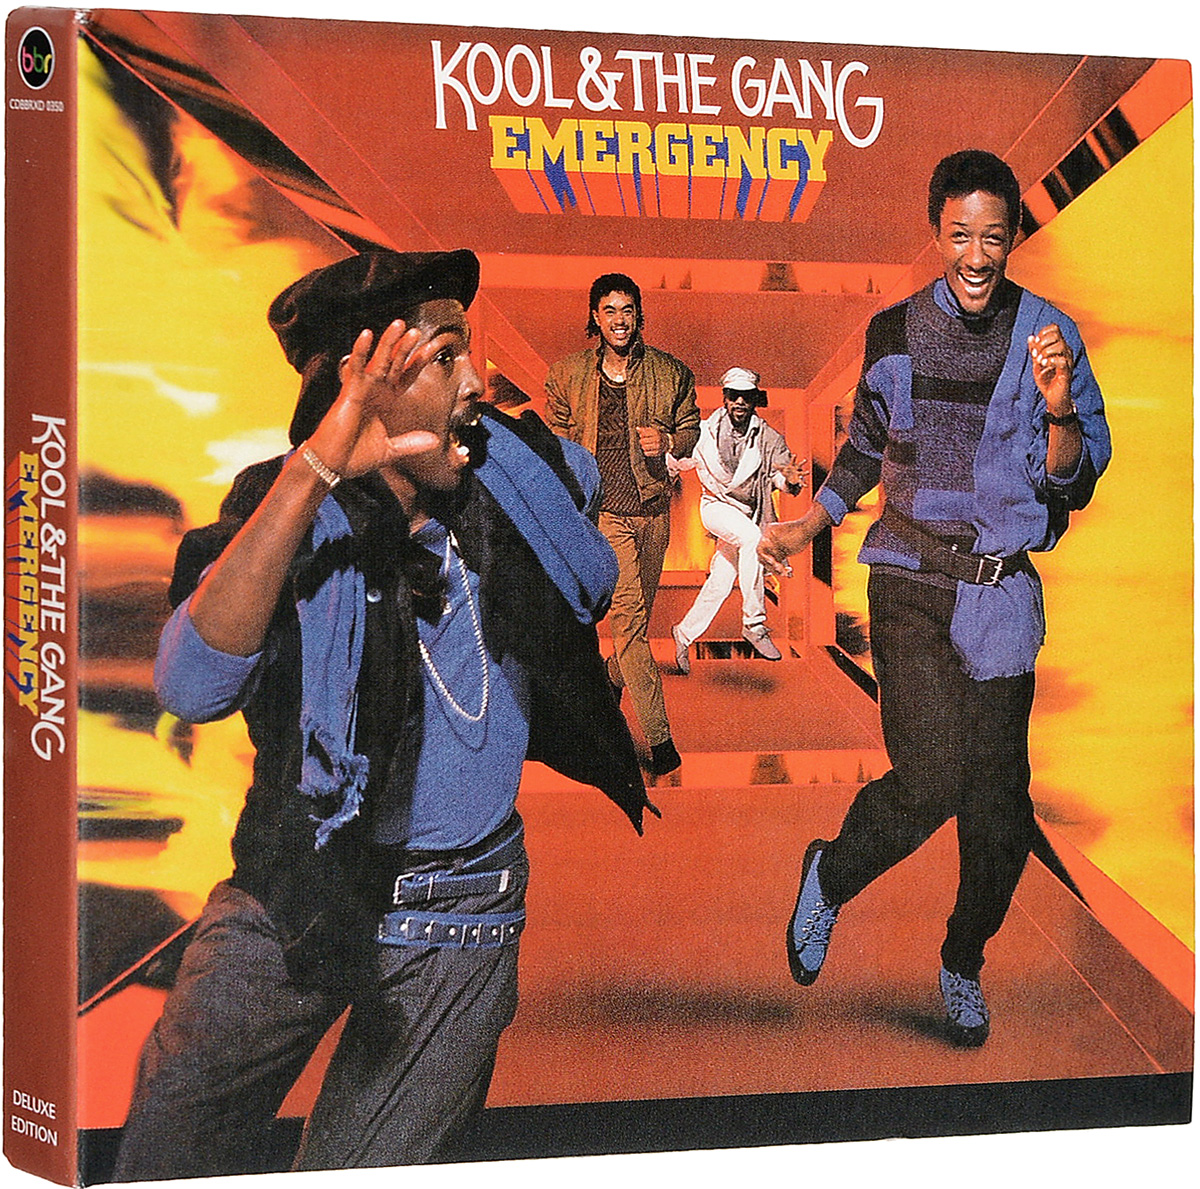 Kool & The Gang Kool & The Gang. Emergency (2 CD) the magic gang the magic gang the magic gang